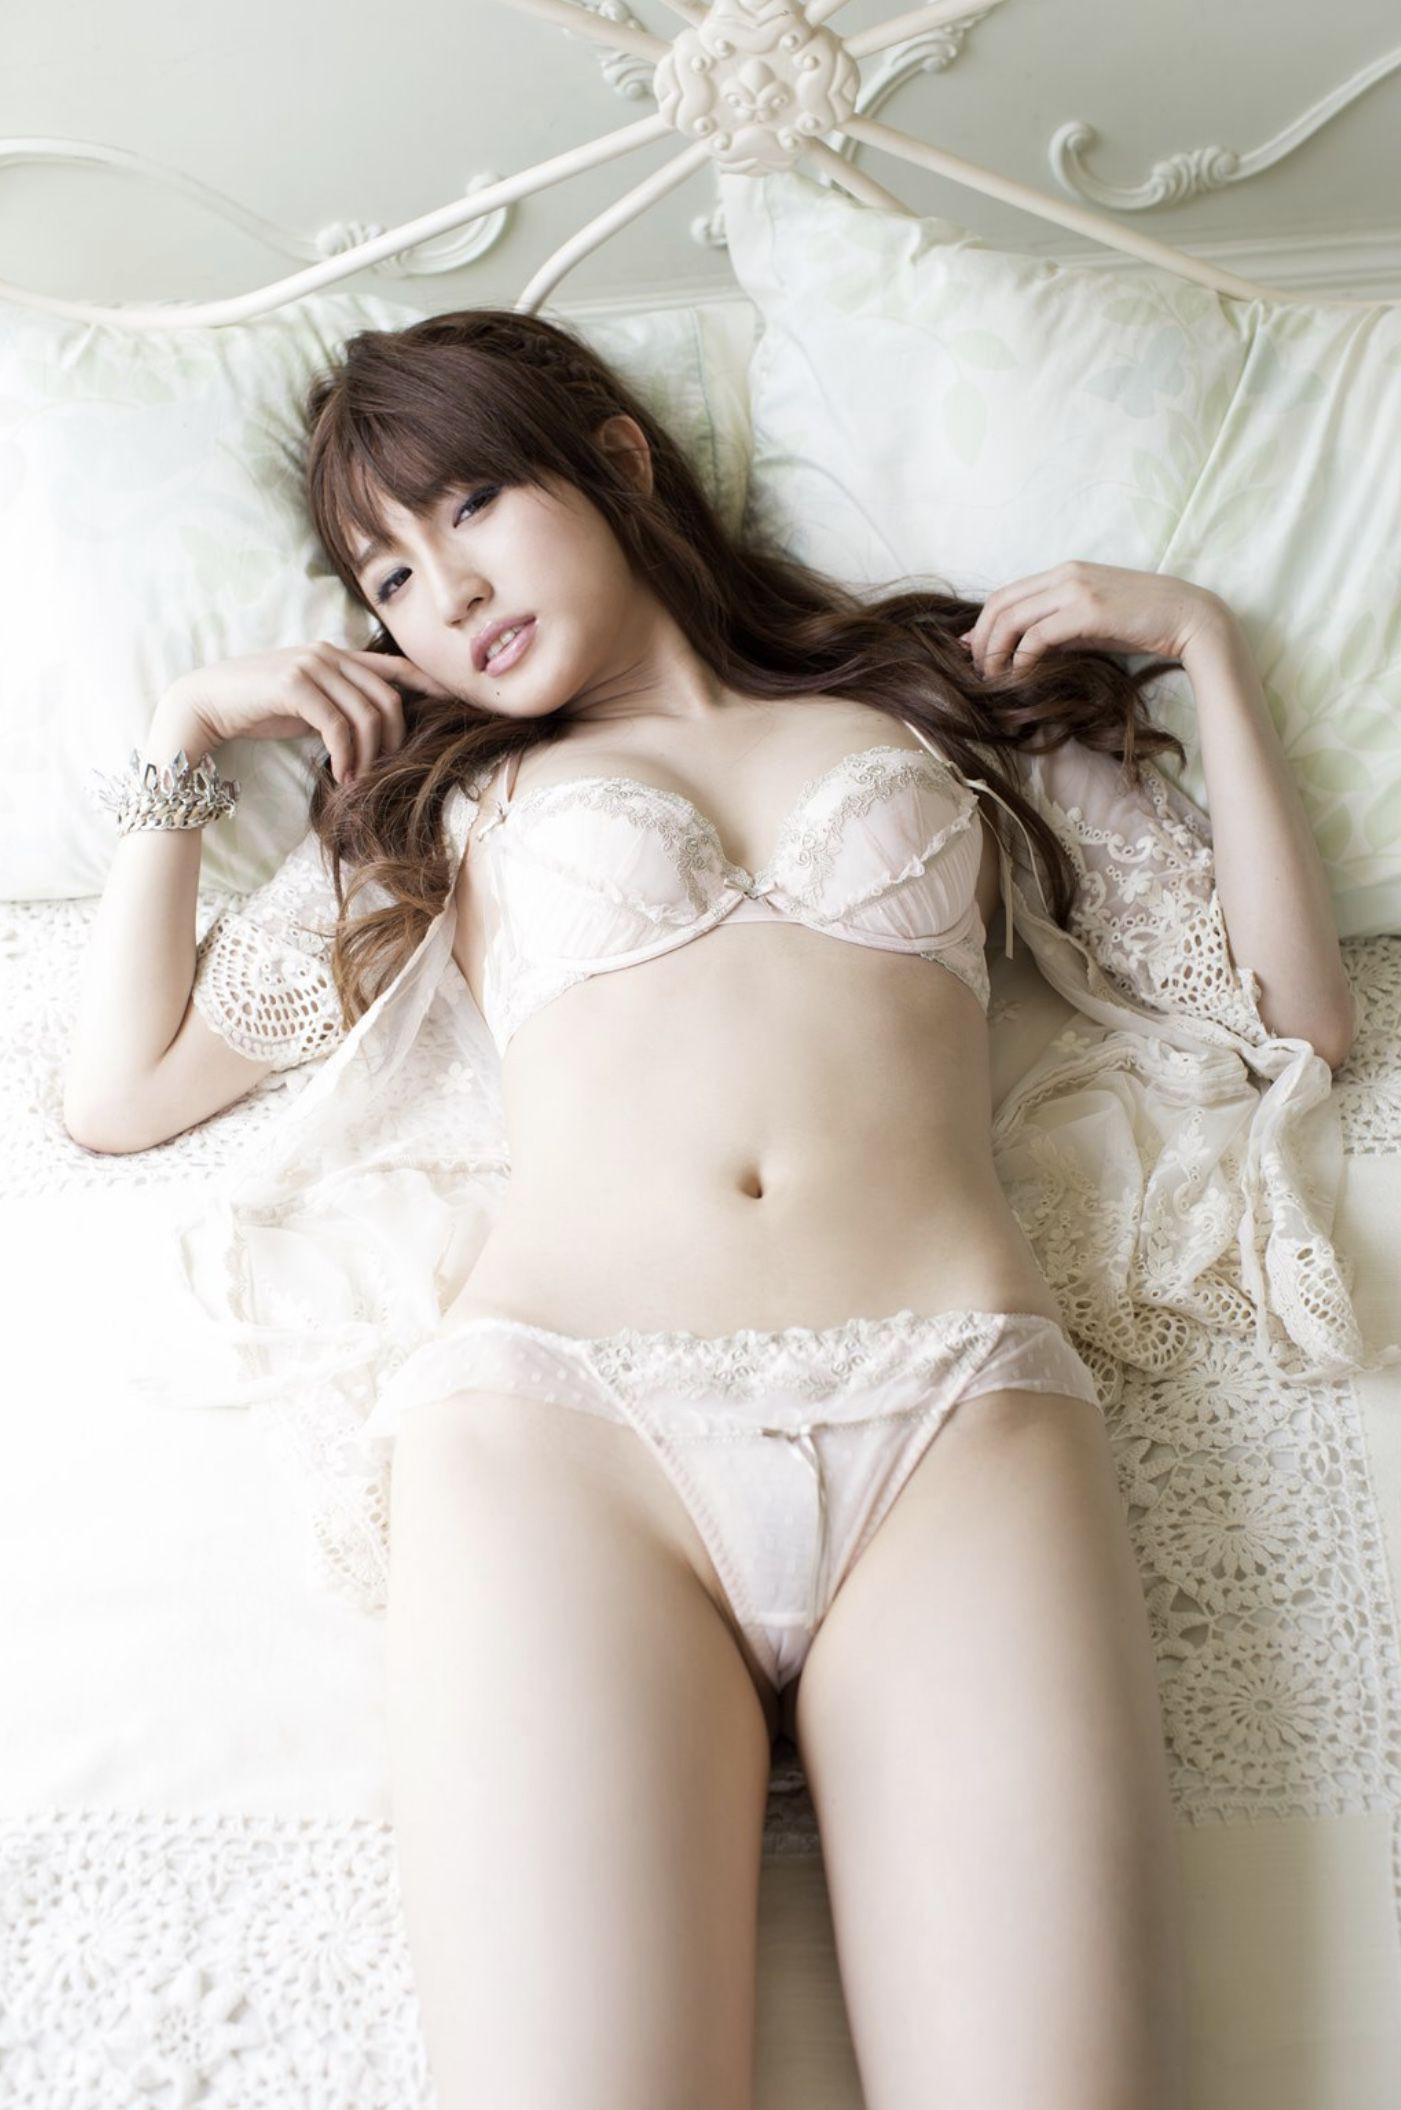 AVデビュー直前ヌード 愛沢かりん photo 017